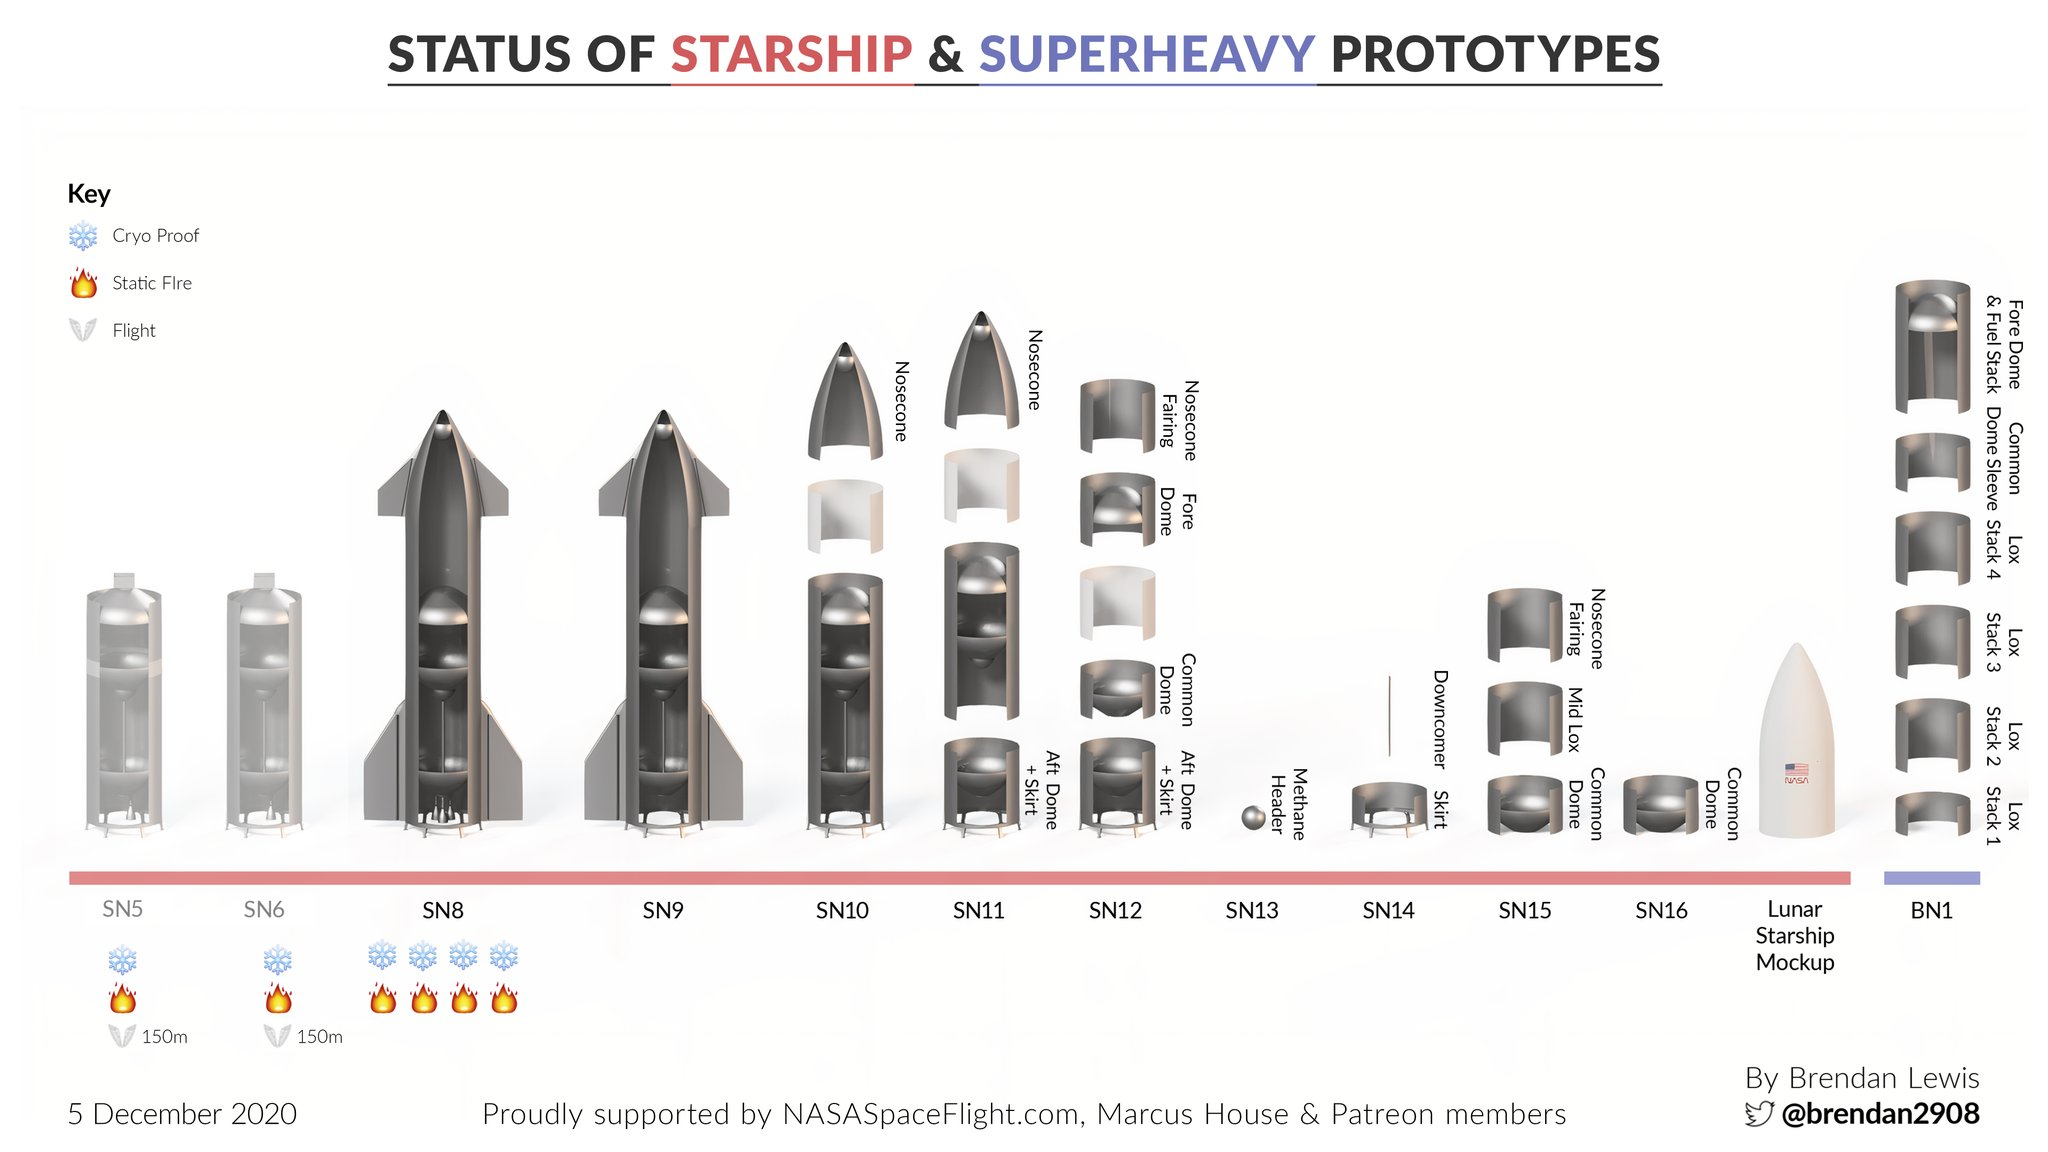 Point de situation des Starship & Superheavy 11640